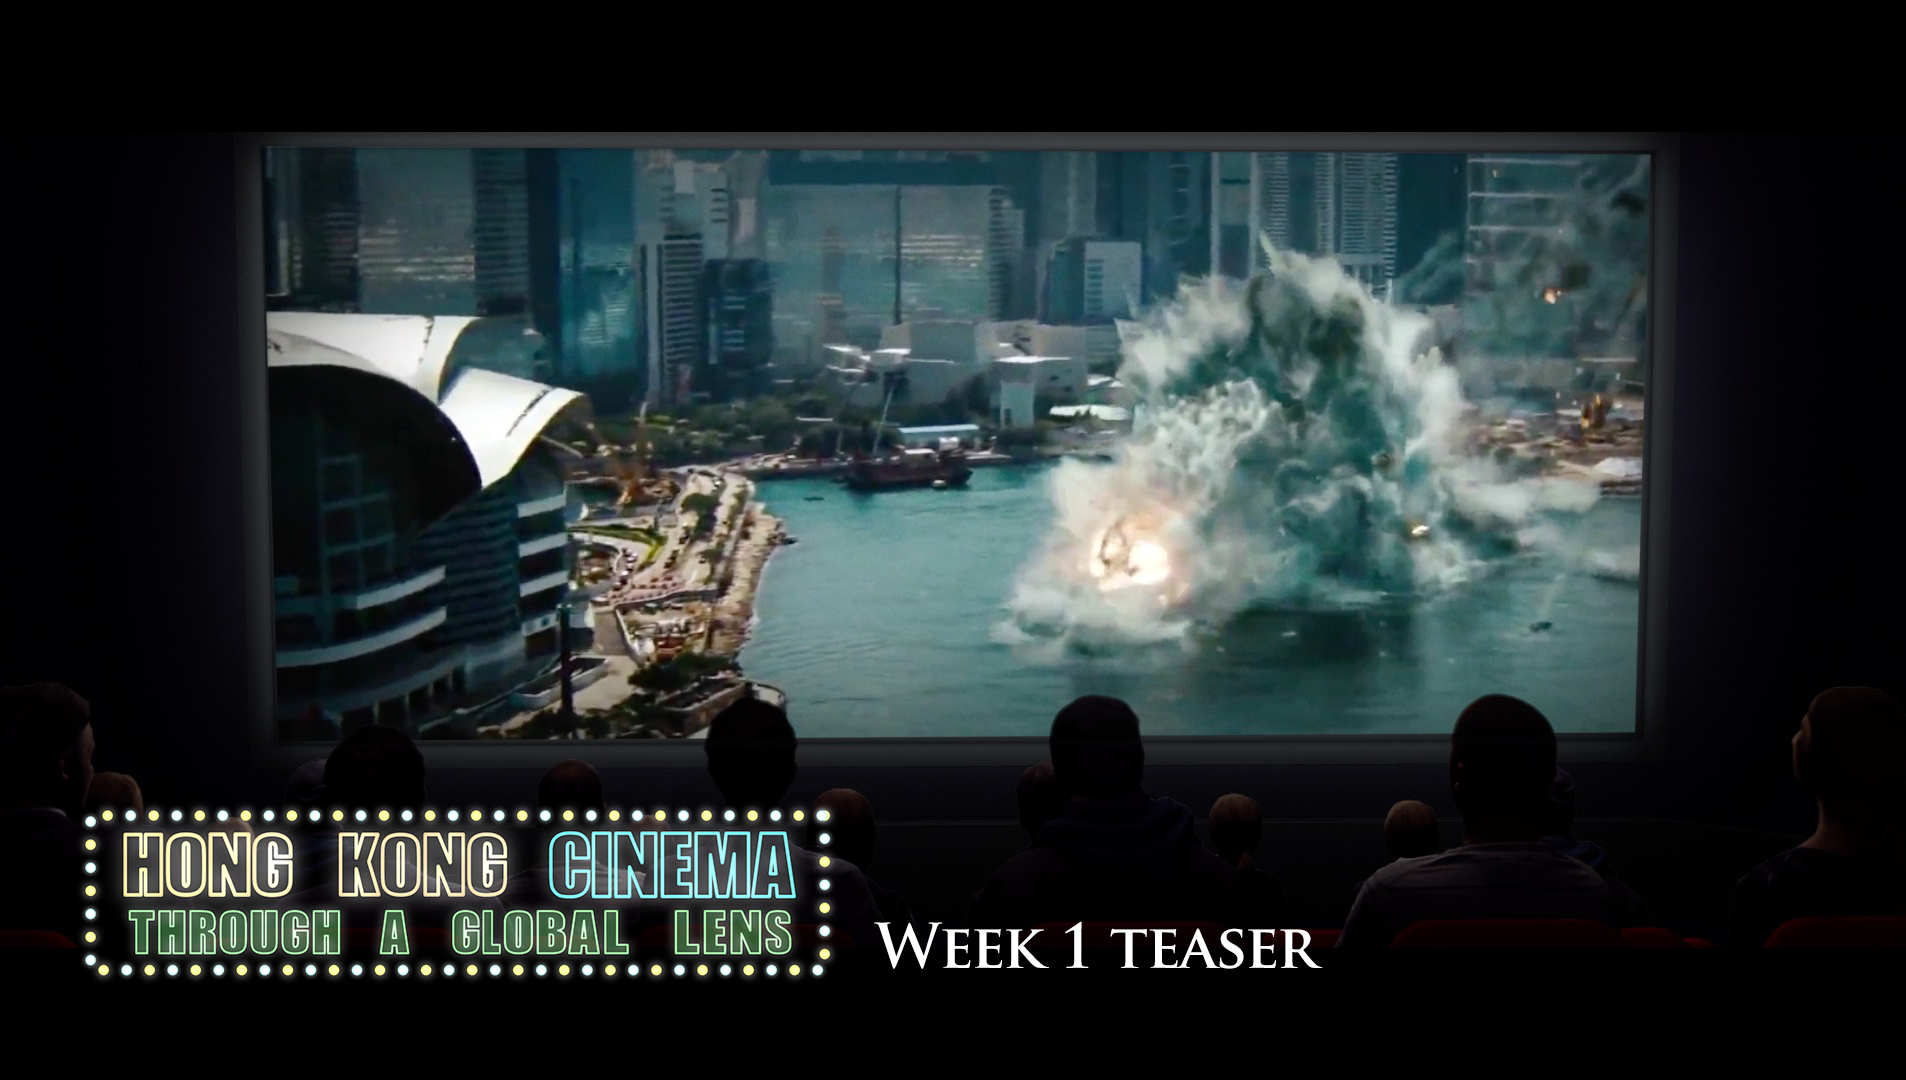 Week 1 Teaser